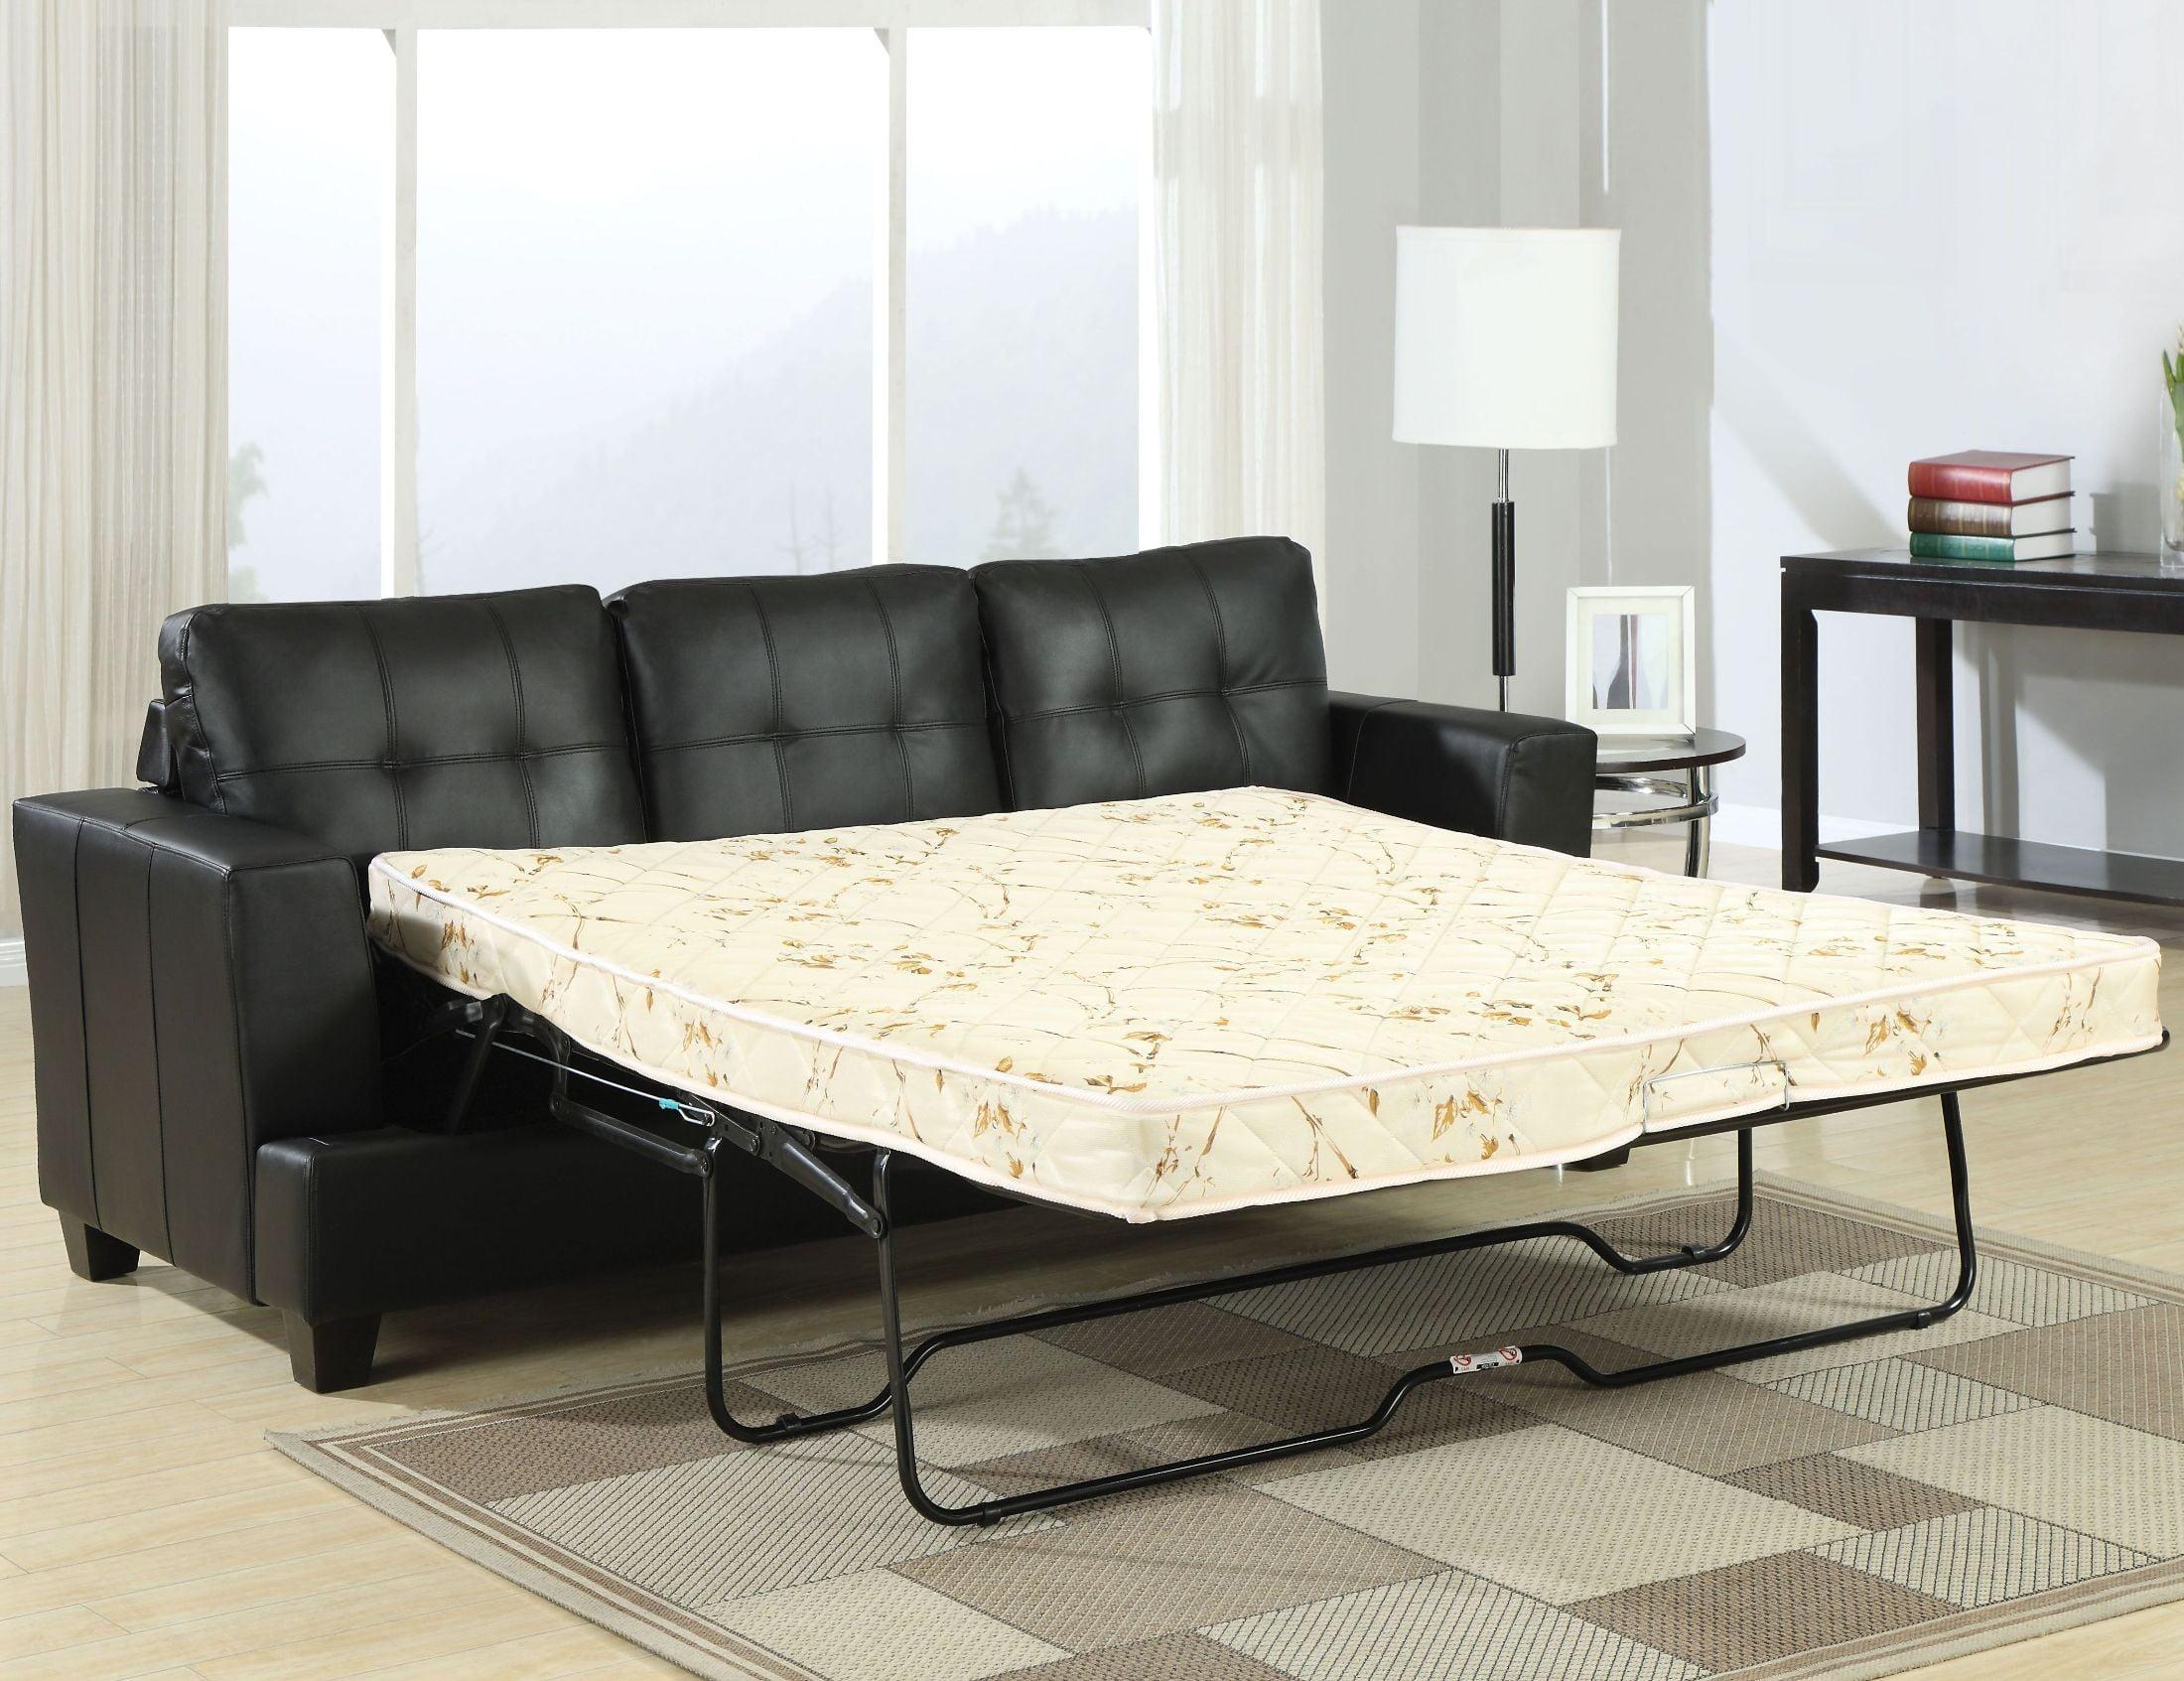 Platinum Black Bonded Leather Living Room Set from Acme | Coleman ...